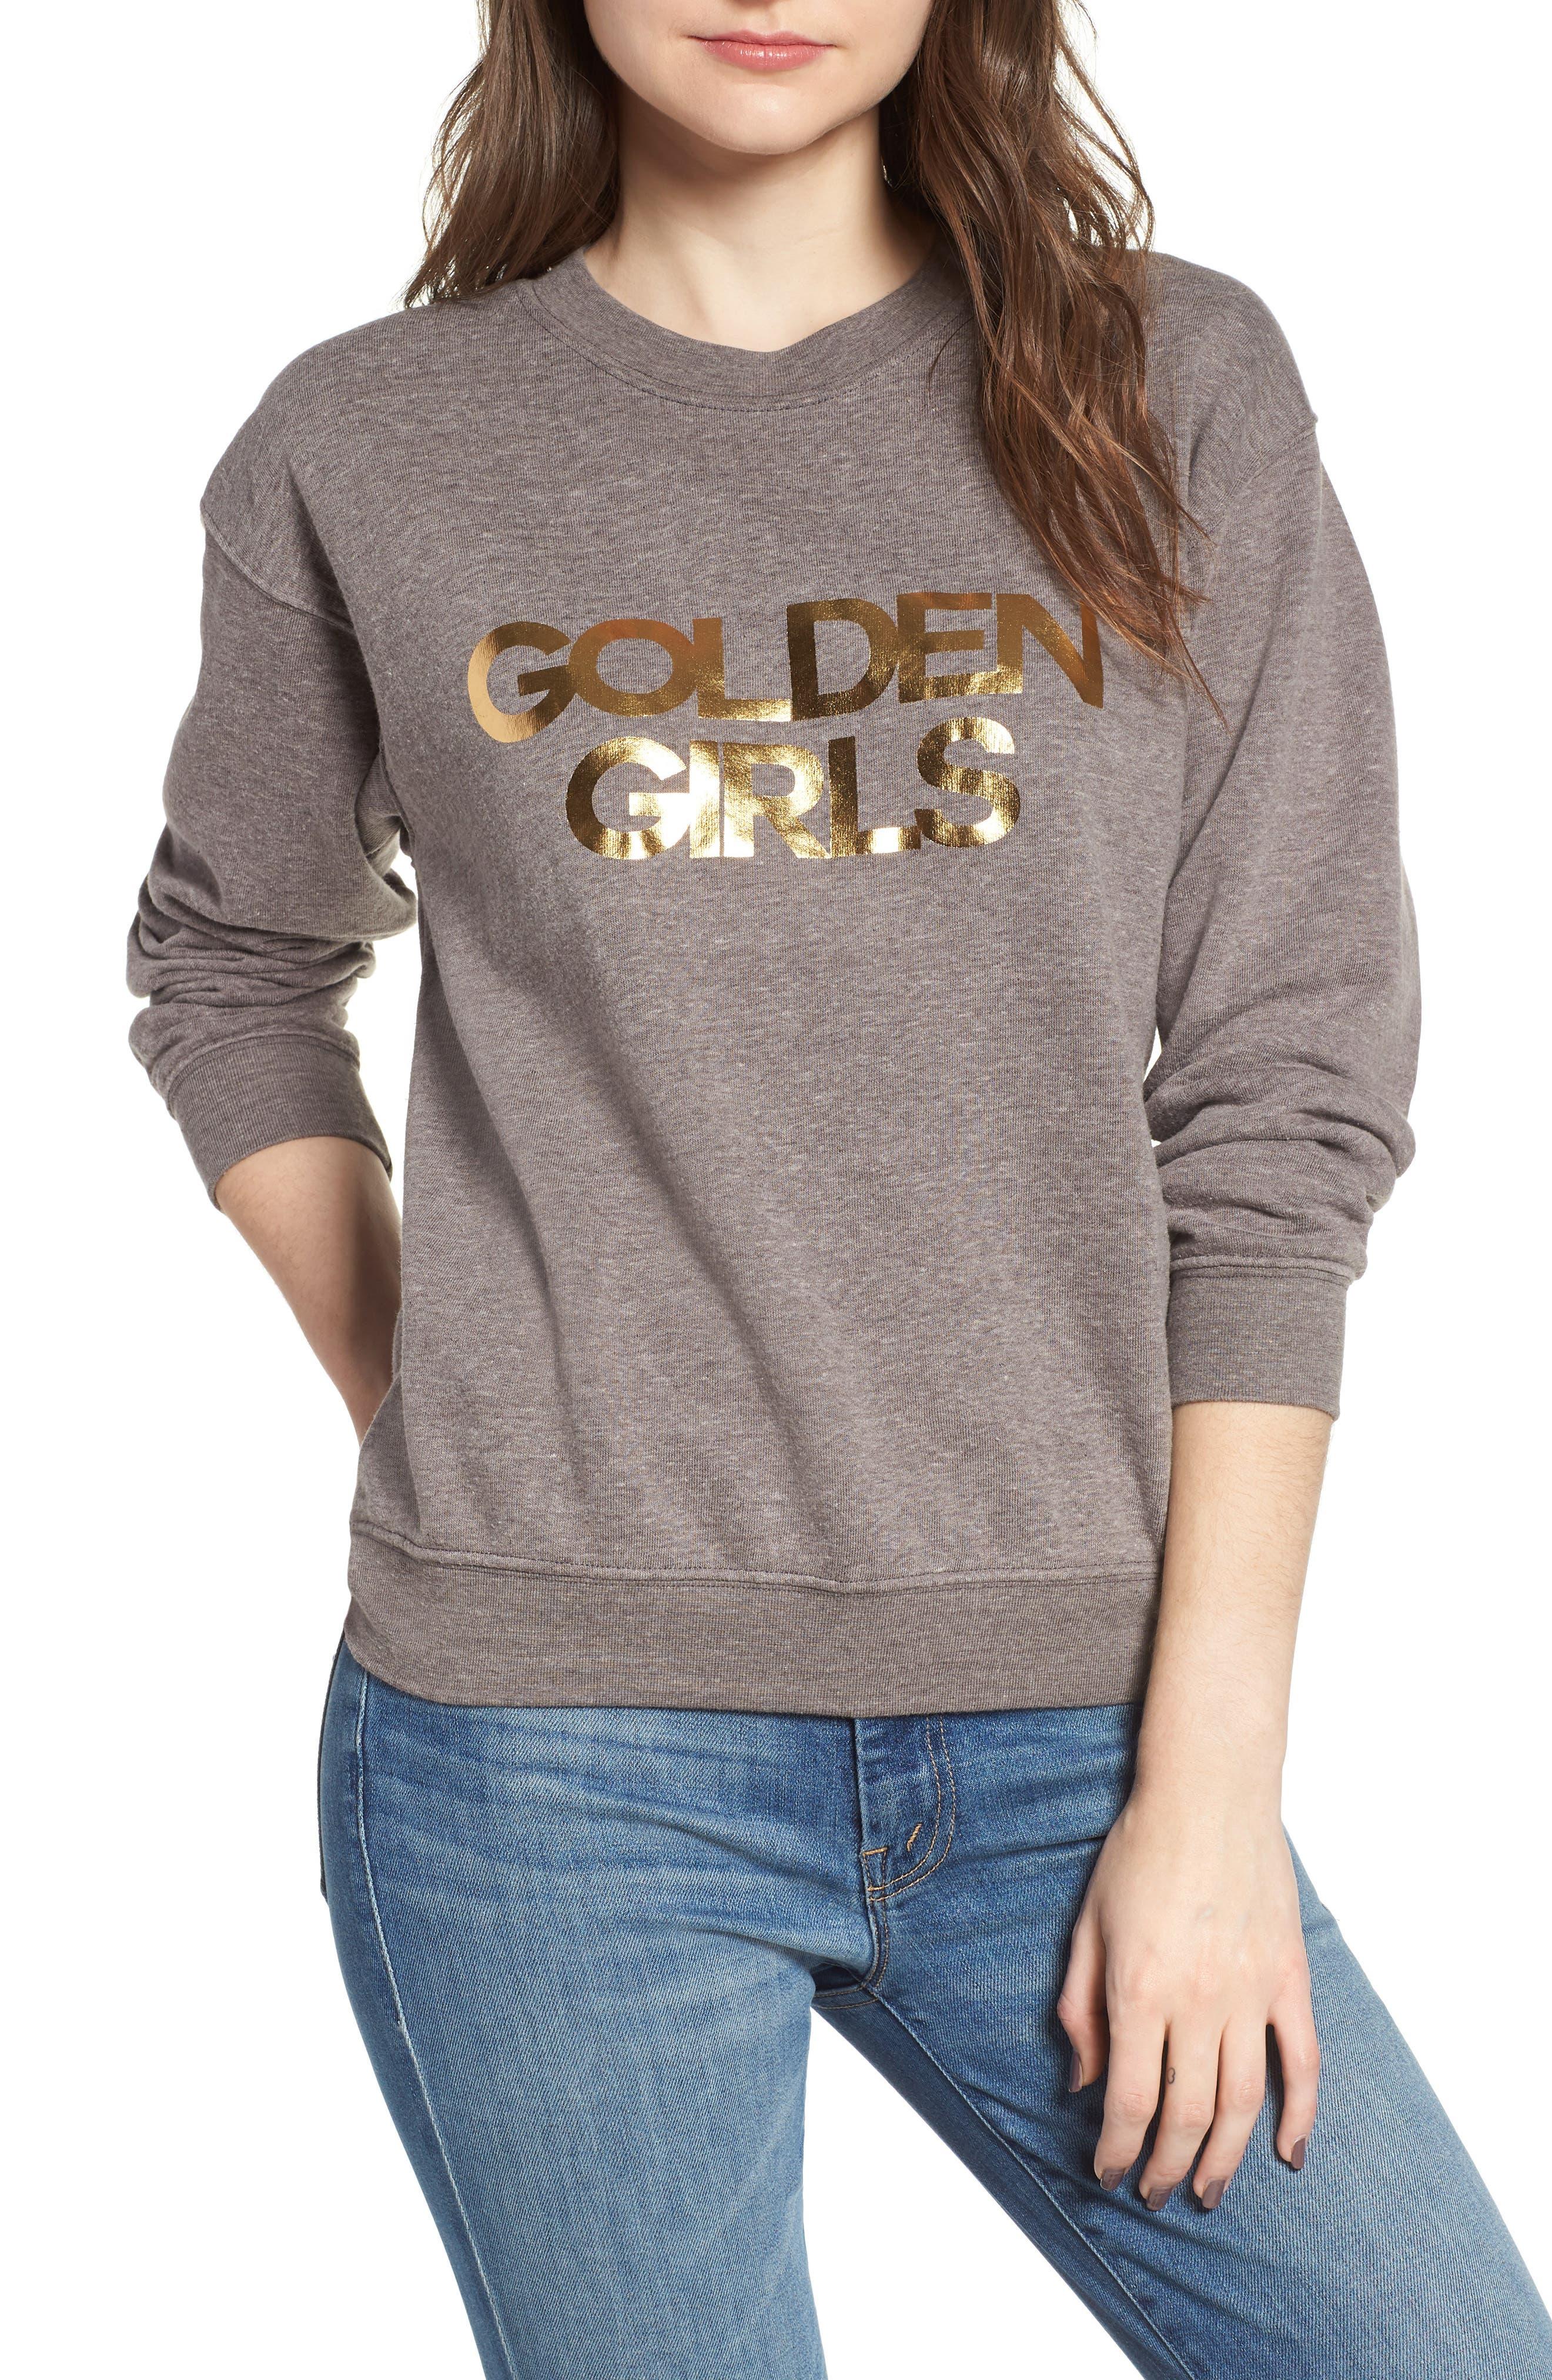 Golden Girls Willow Sweatshirt,                             Main thumbnail 1, color,                             Heather Grey